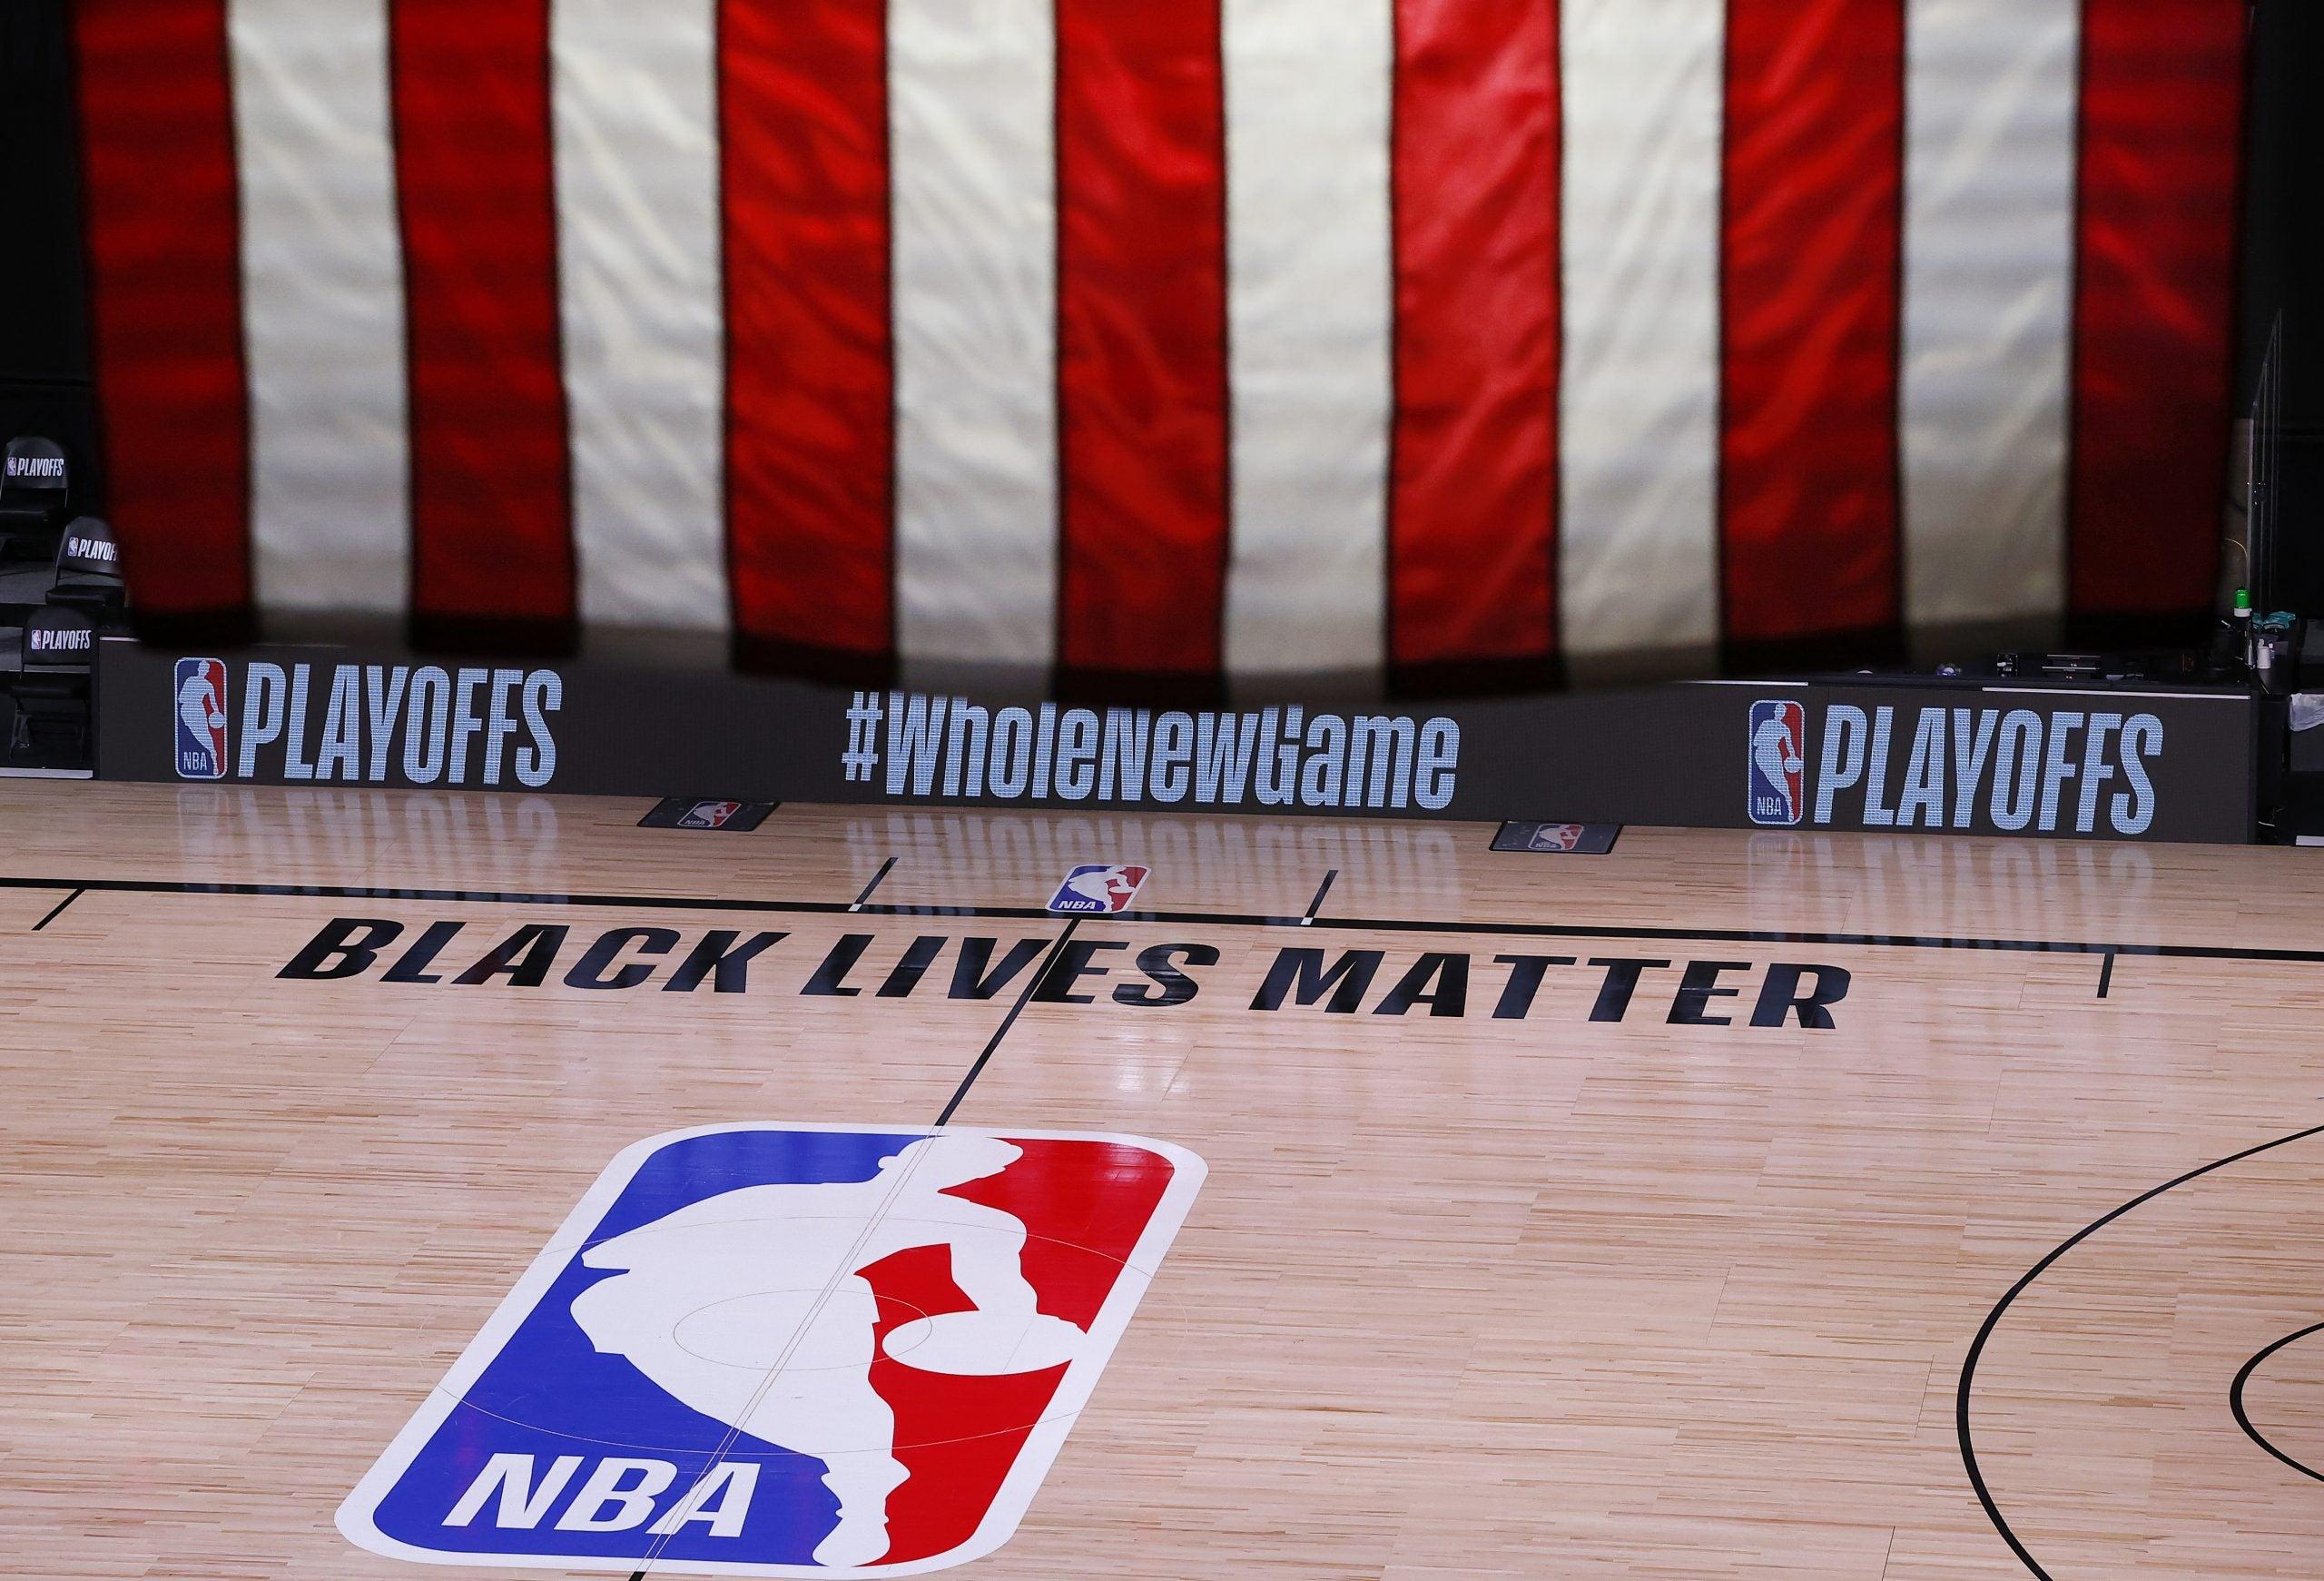 NBA And WNBA Players Sit Out Playoffs Over Jacob Blake Shooting